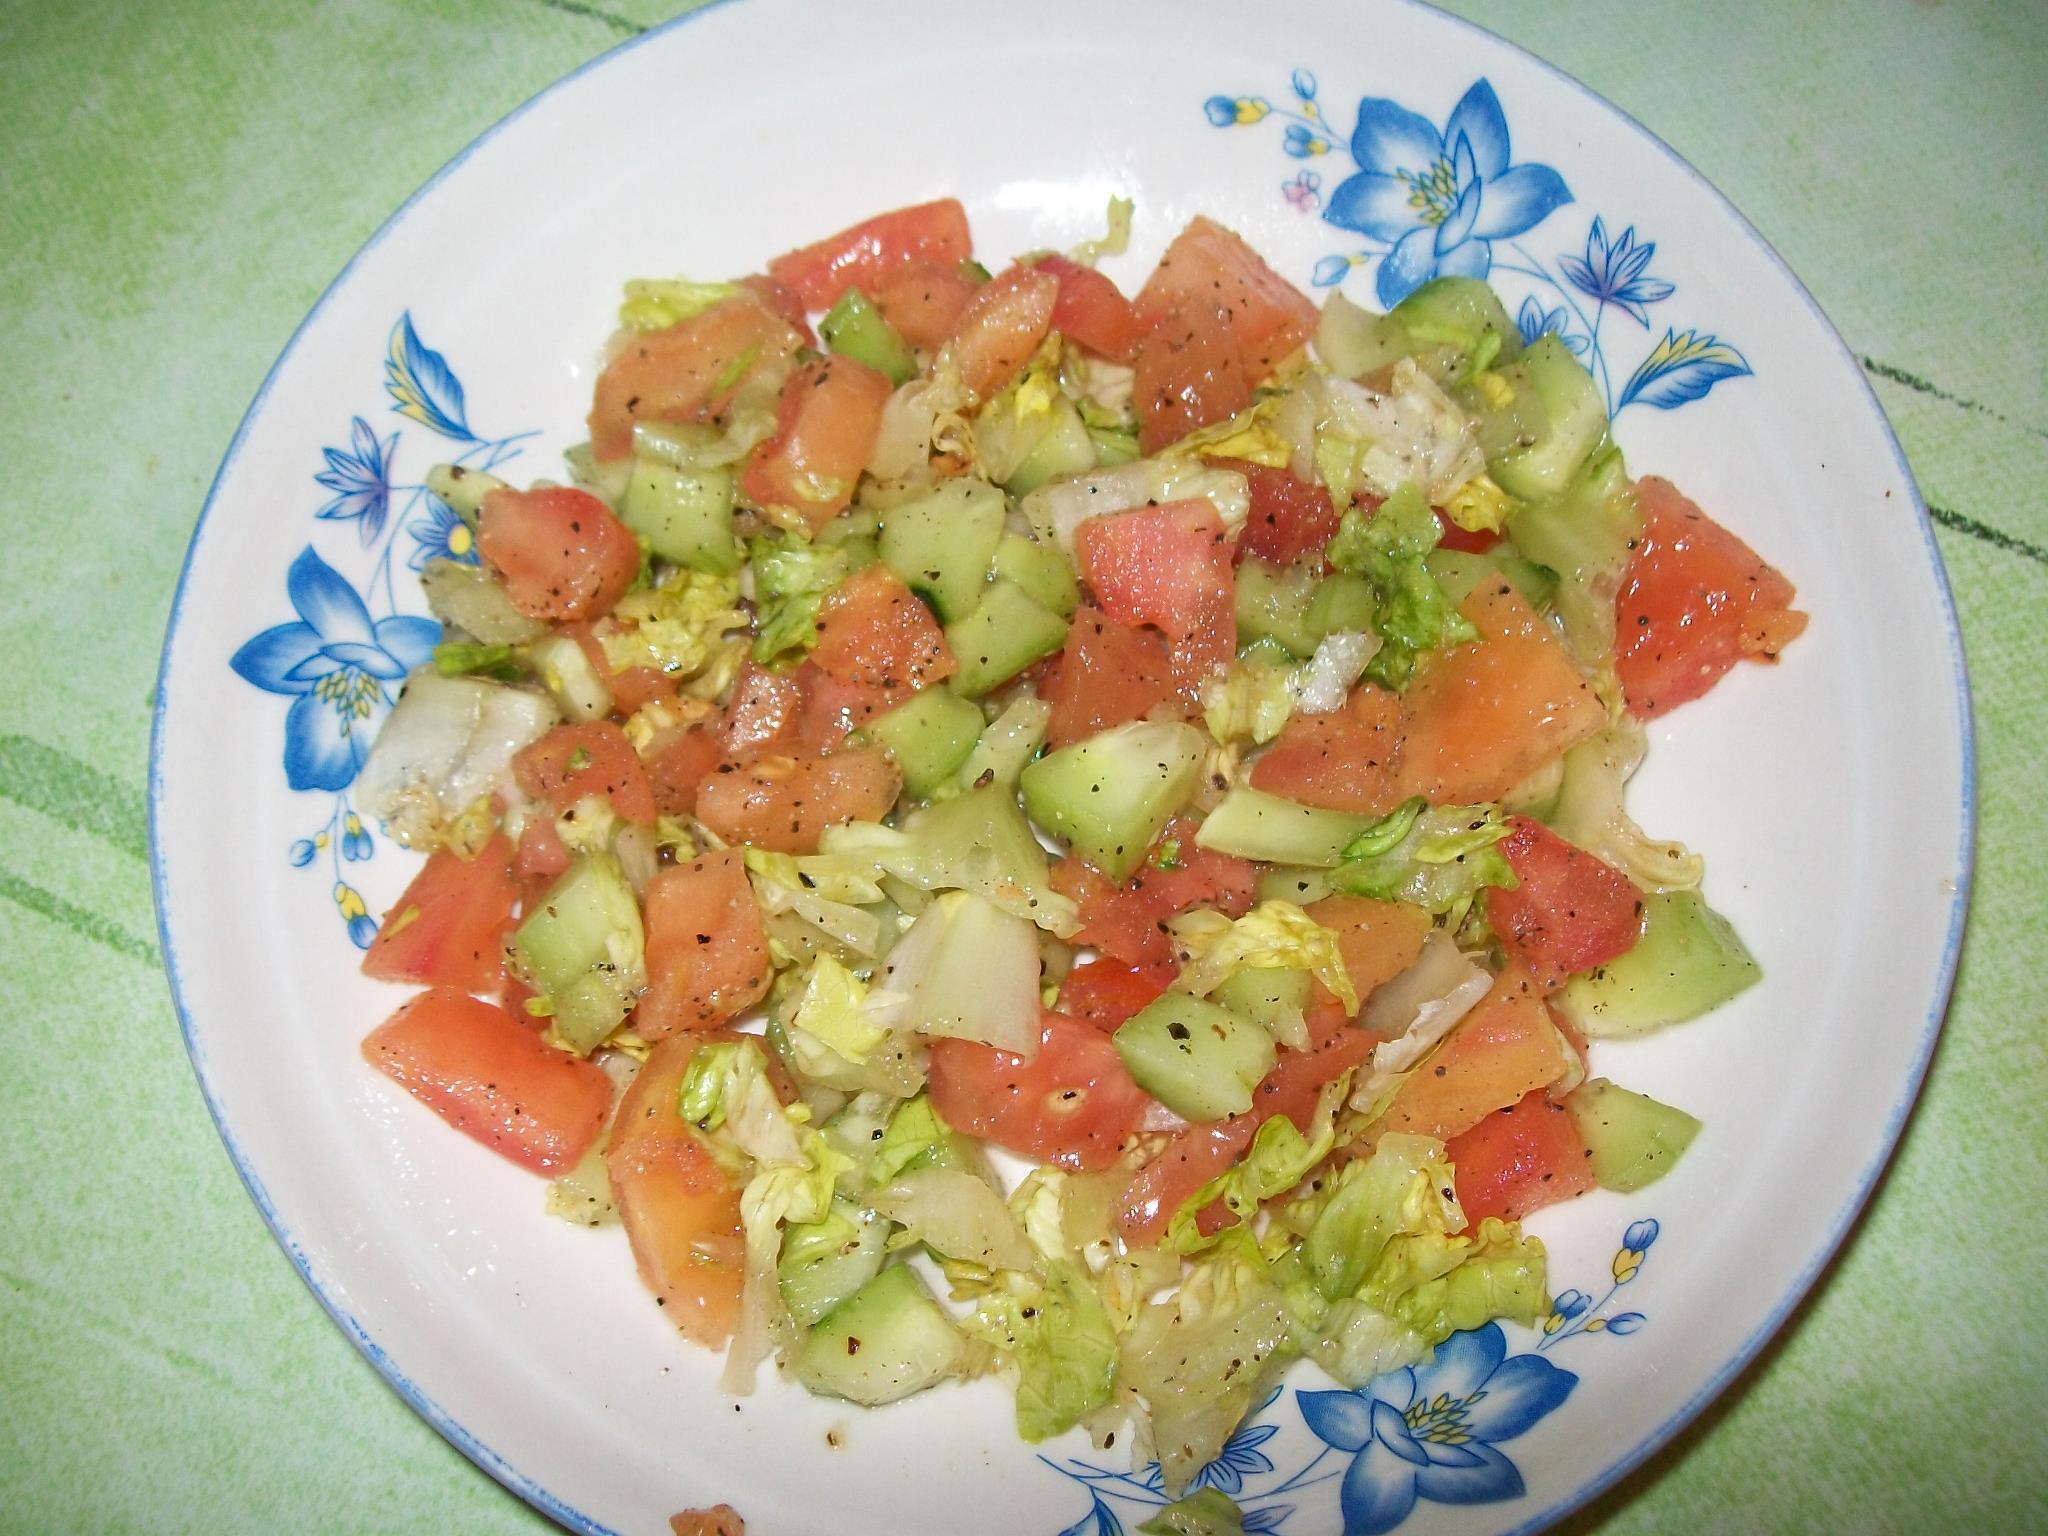 salade verte aux tomates